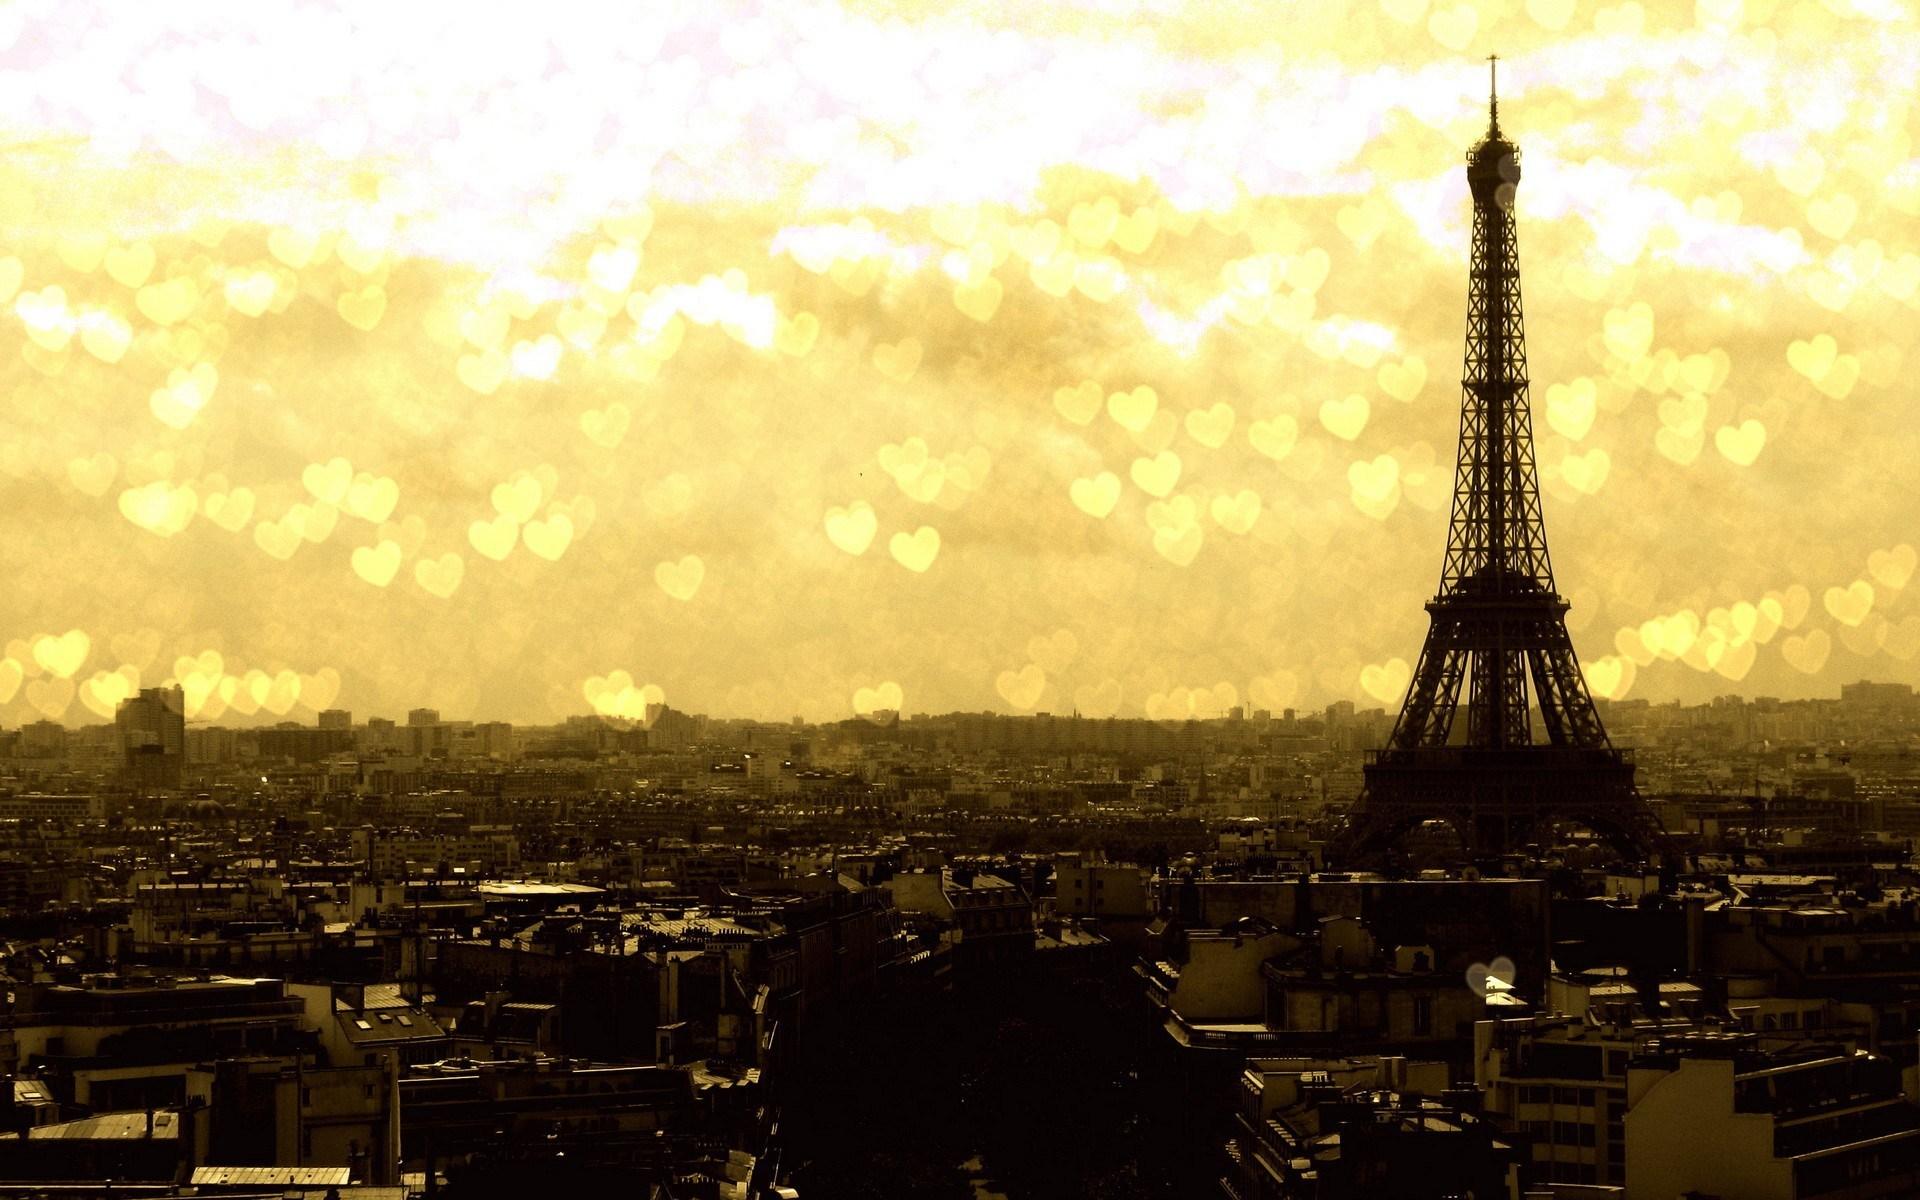 paris wallpaper 22125 1920x1200 px